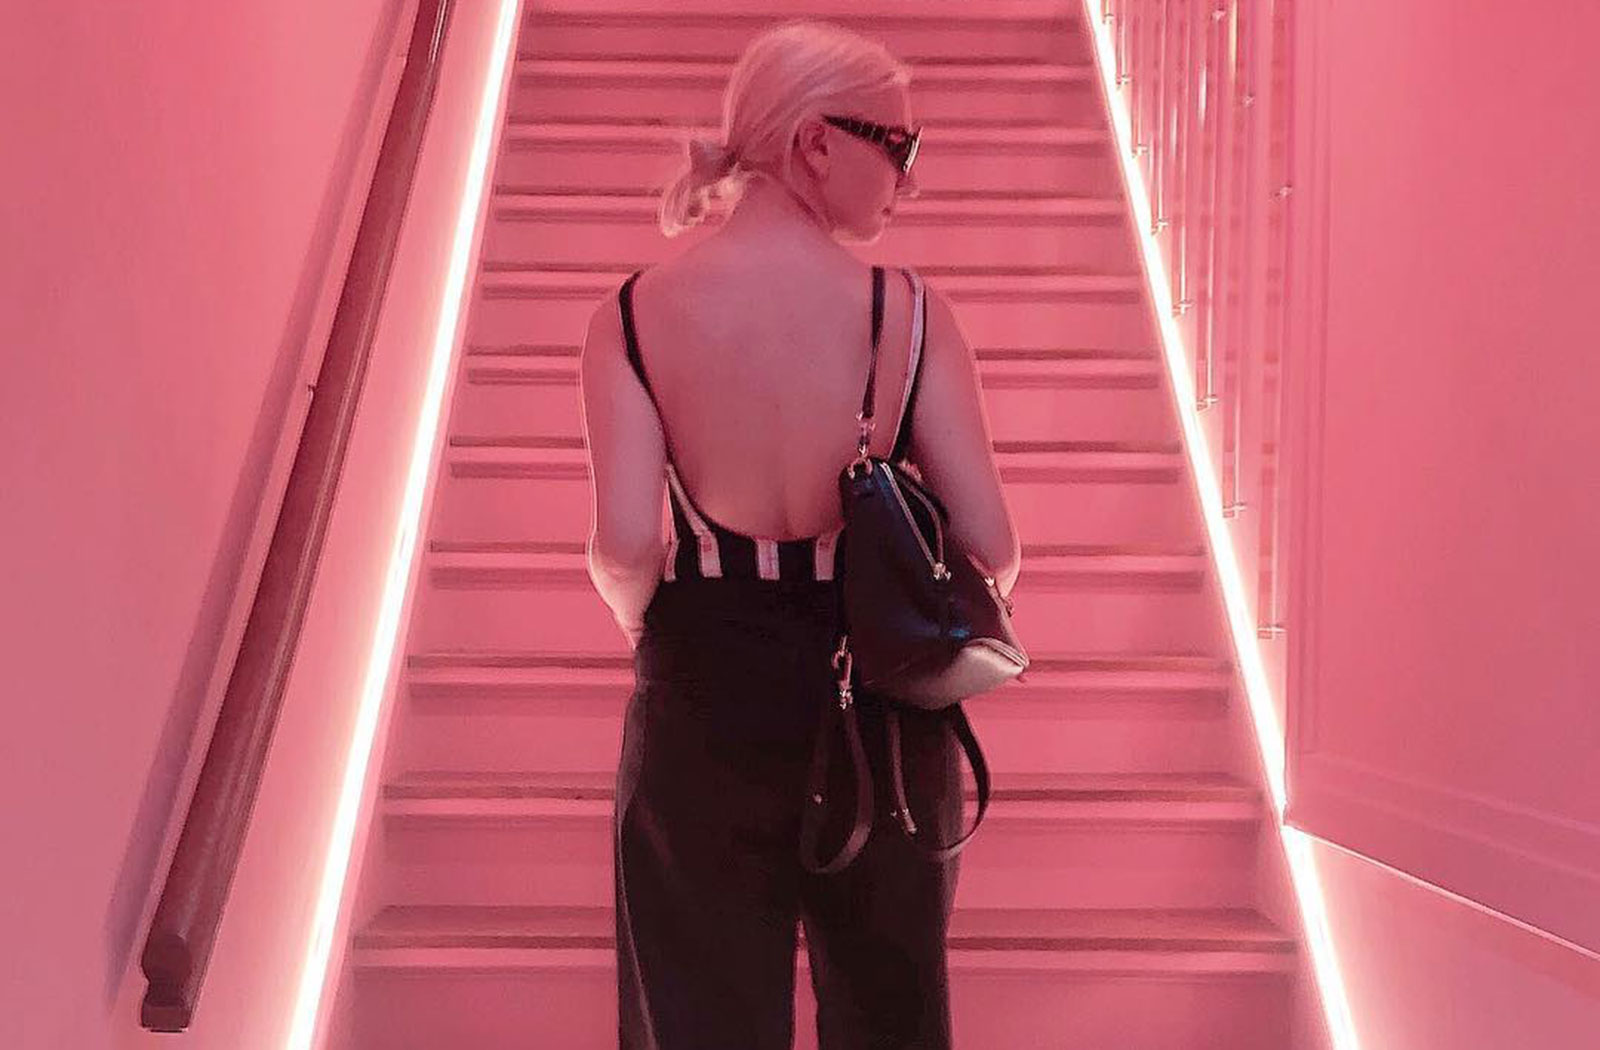 roze instagram spots amsterdam moco museum